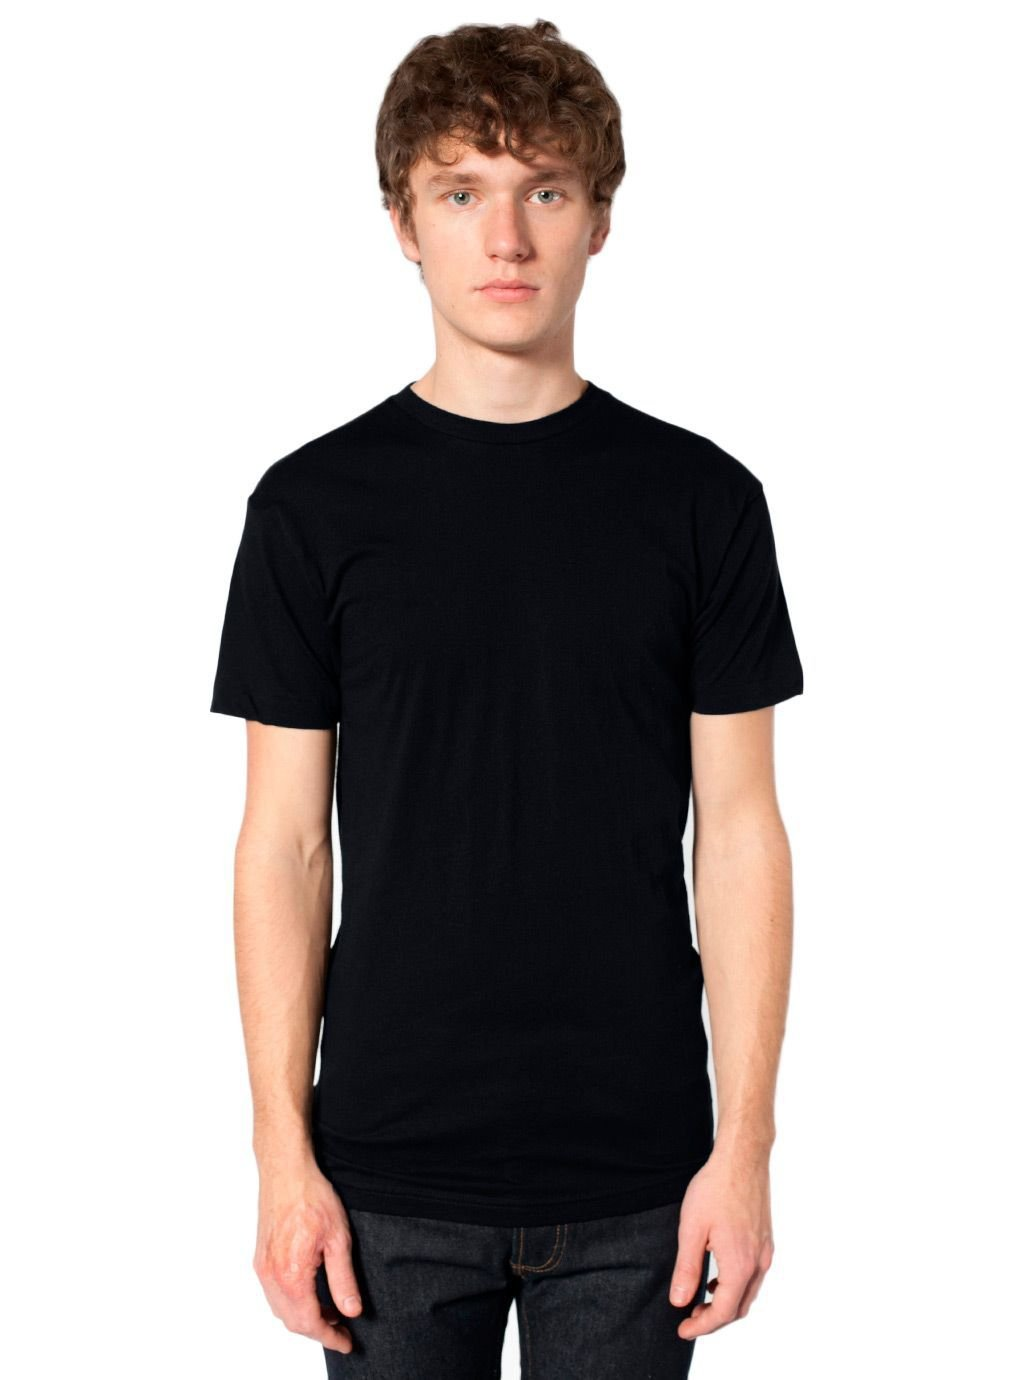 American Apparel Men Sheer Jersey Crewneck 'Summer' T-Shirt Size XS Black